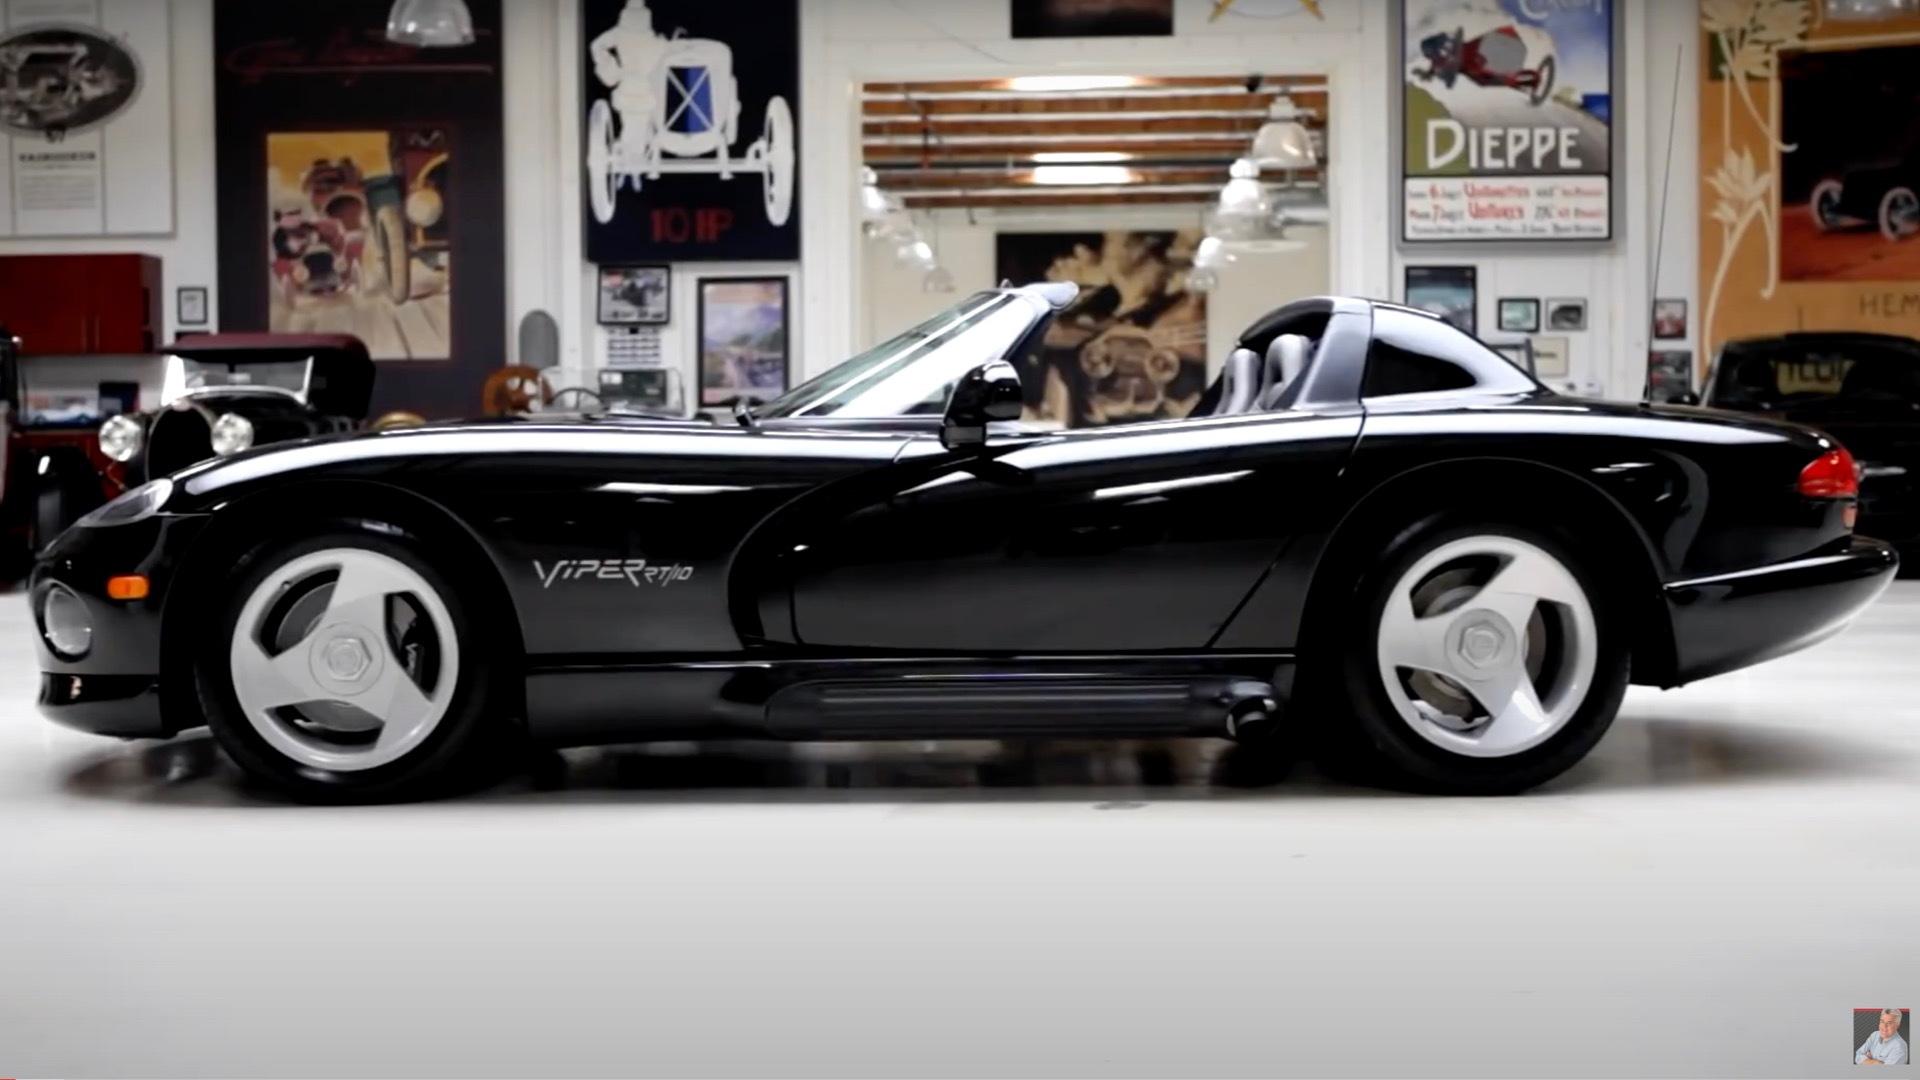 1993 Dodge Viper on Jay Leno's Garage